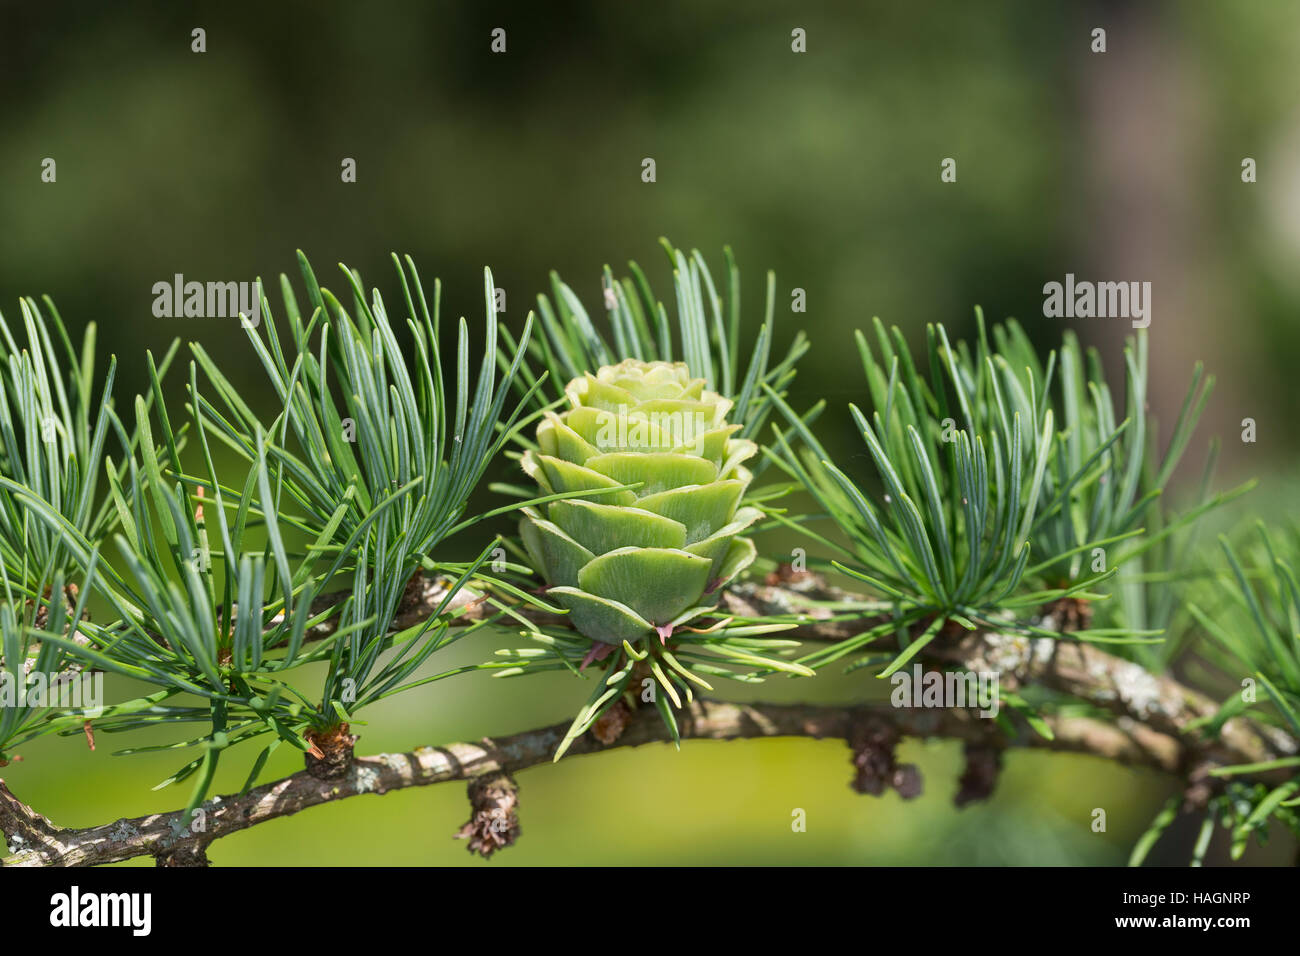 Japanische Lärche, Larix kaempferi, Larix leptolepis, Japanese larch, karamatsu, Le Mélèze du Japon - Stock Image